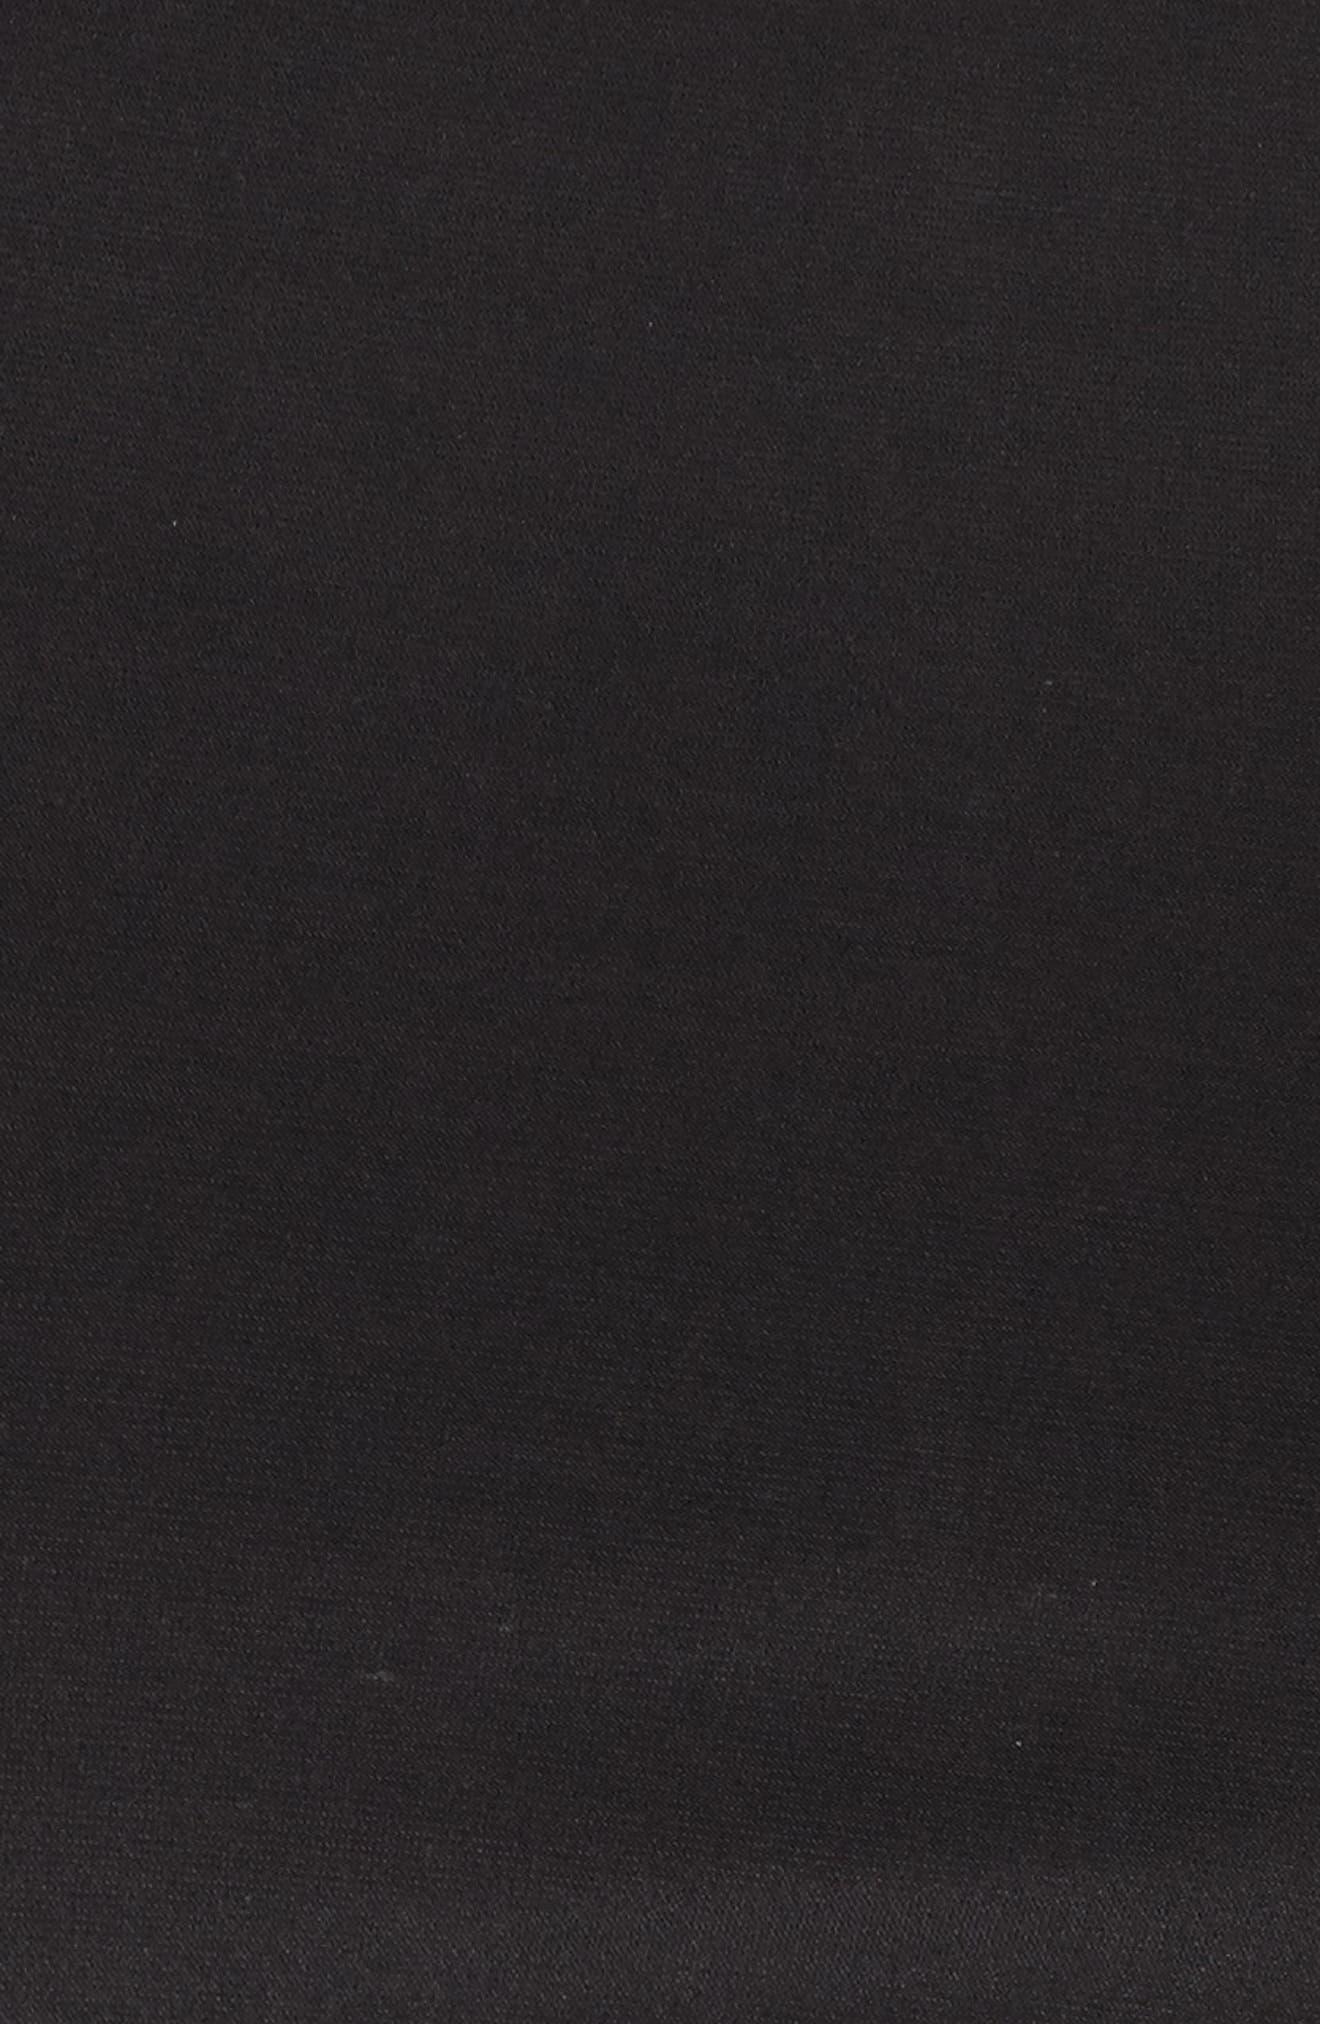 Illusion Yoke Bell Sleeve Sheath Dress,                             Alternate thumbnail 5, color,                             Black